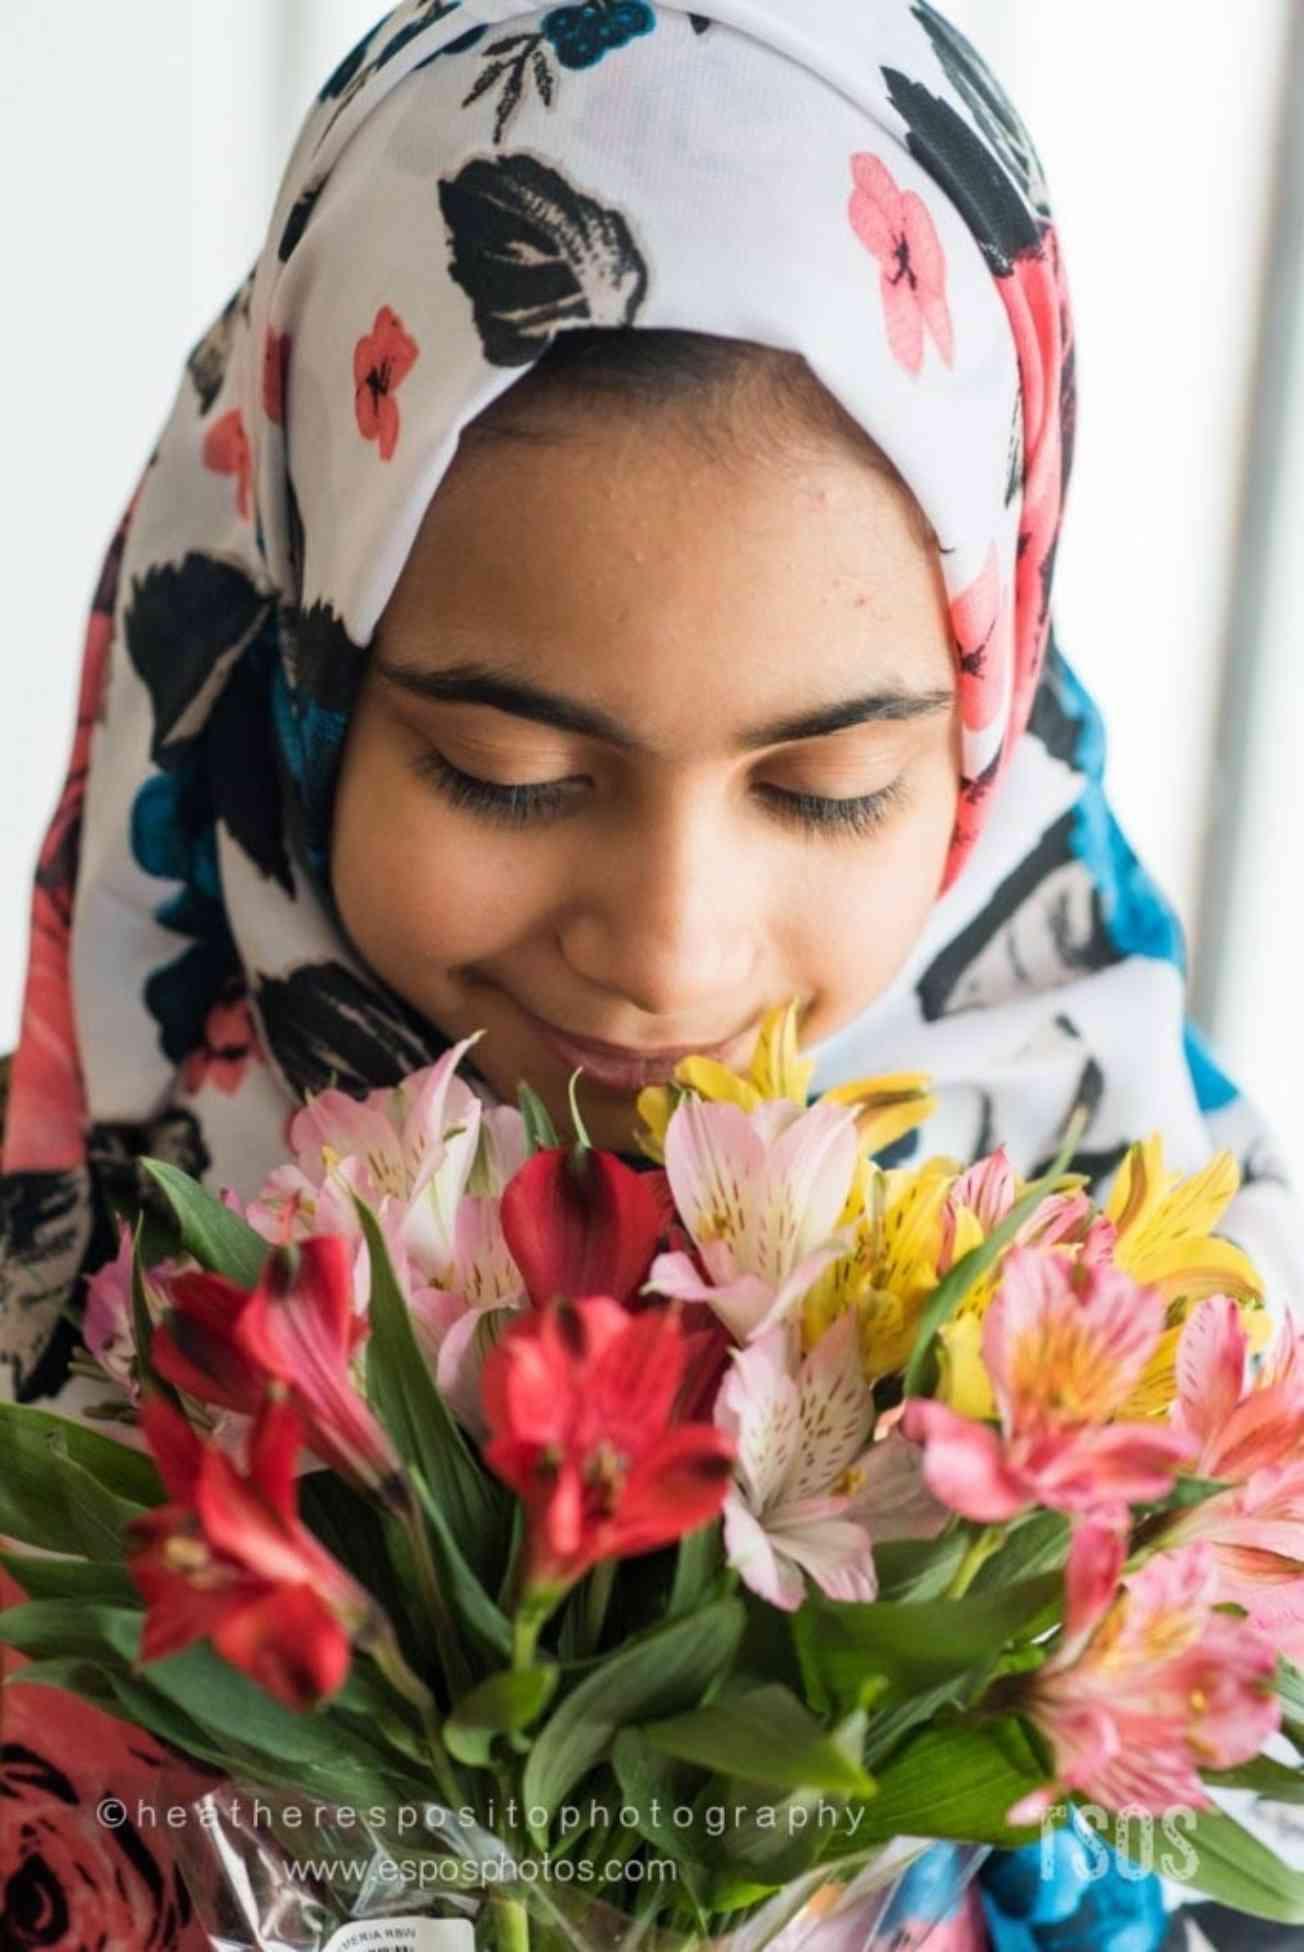 Tiba and flowers